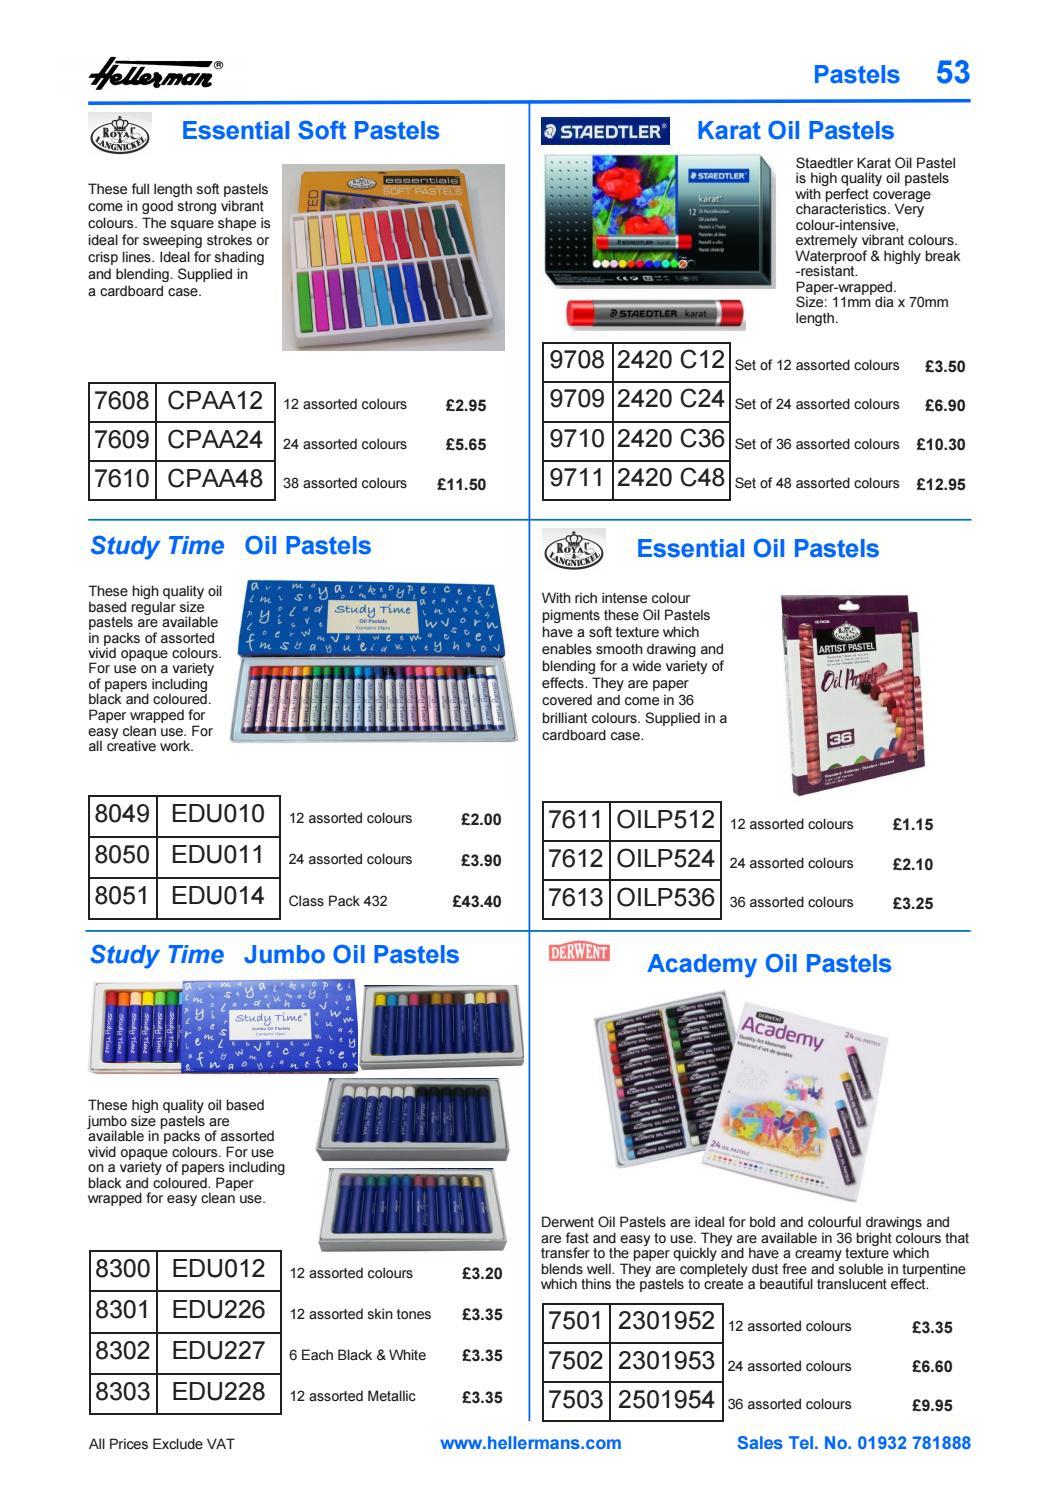 Pack of 12 Metallic Study Time Jumbo Oil Pastels